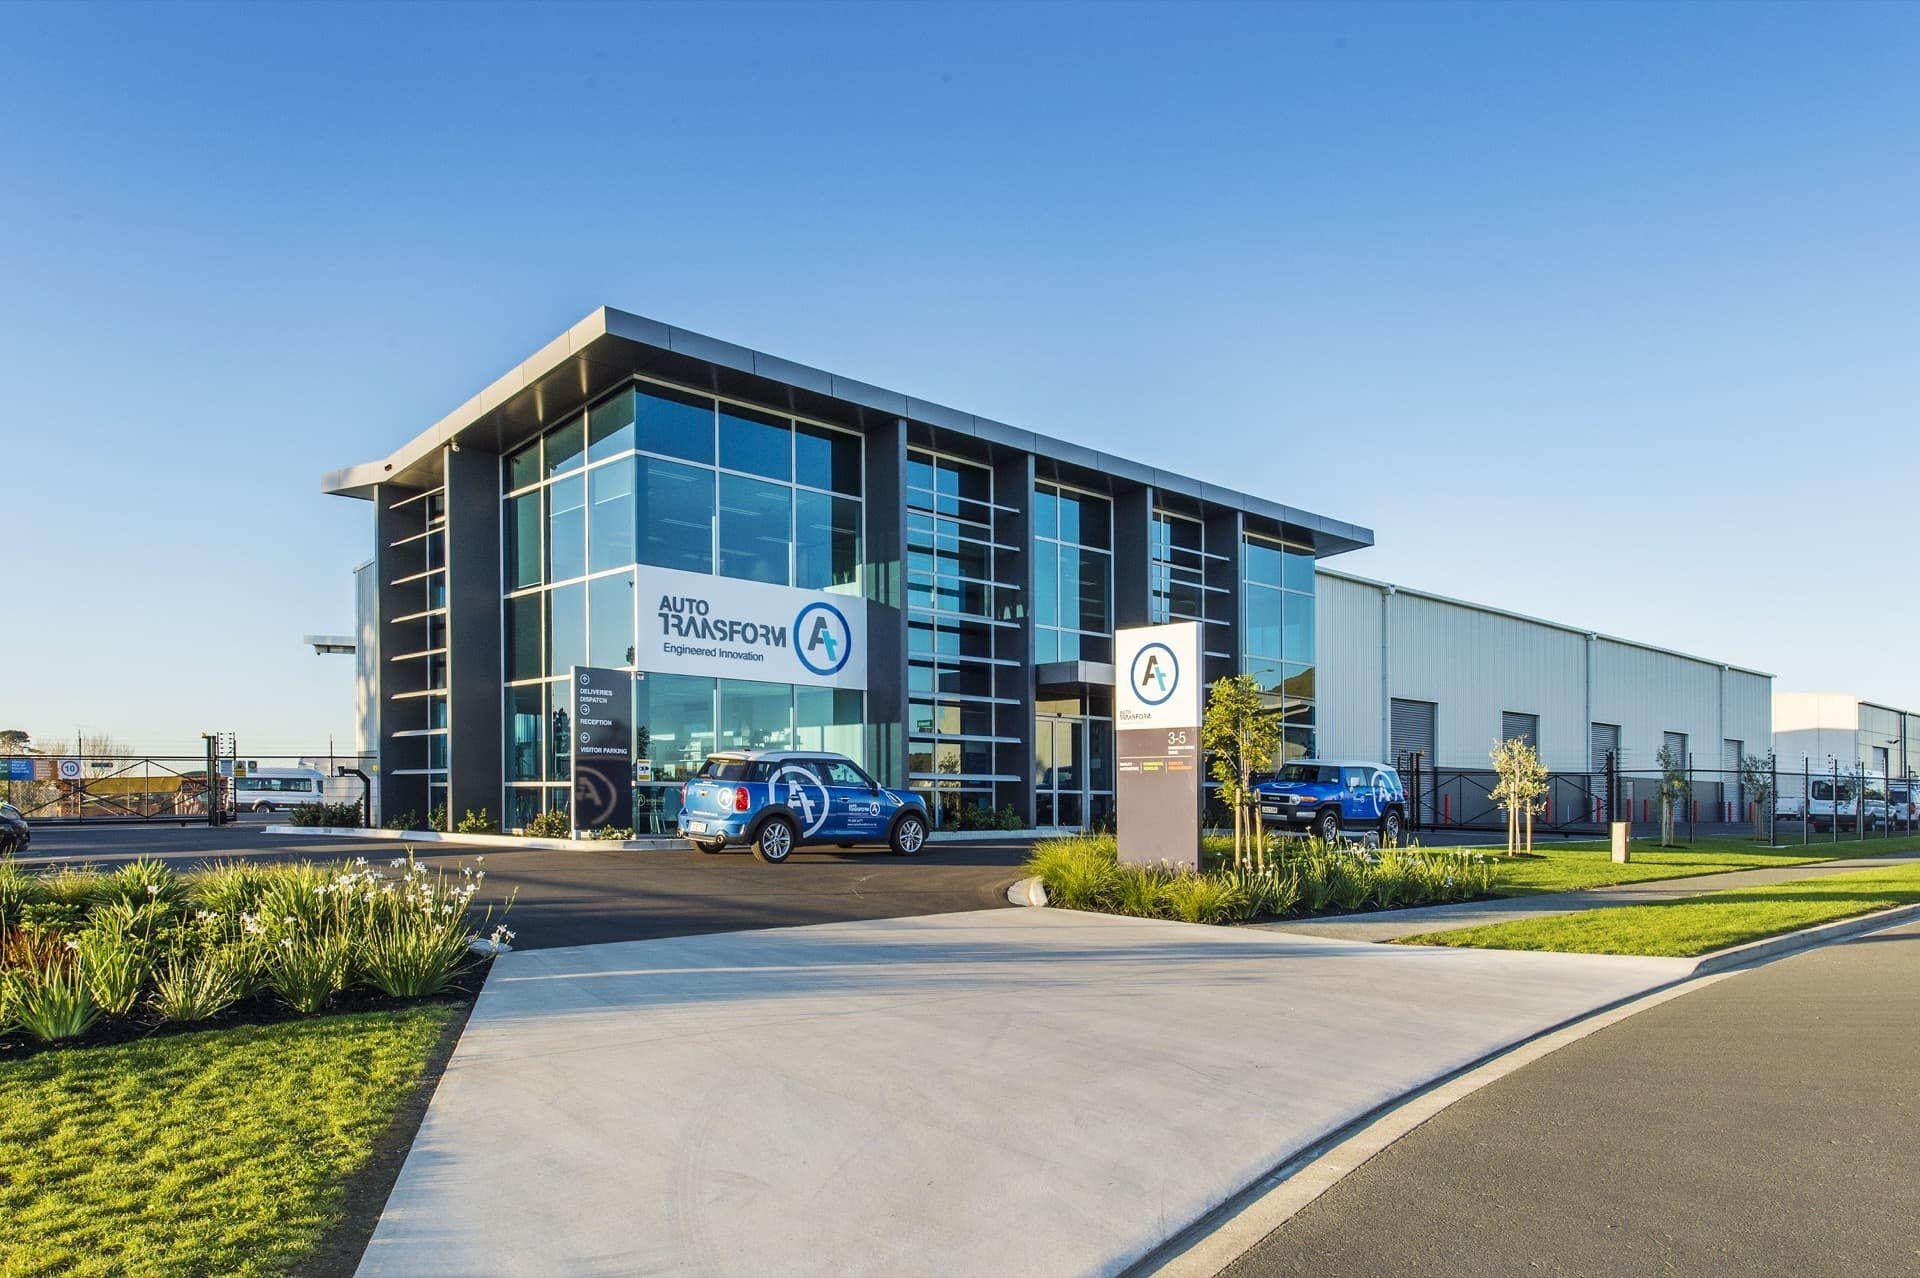 Auto transform building